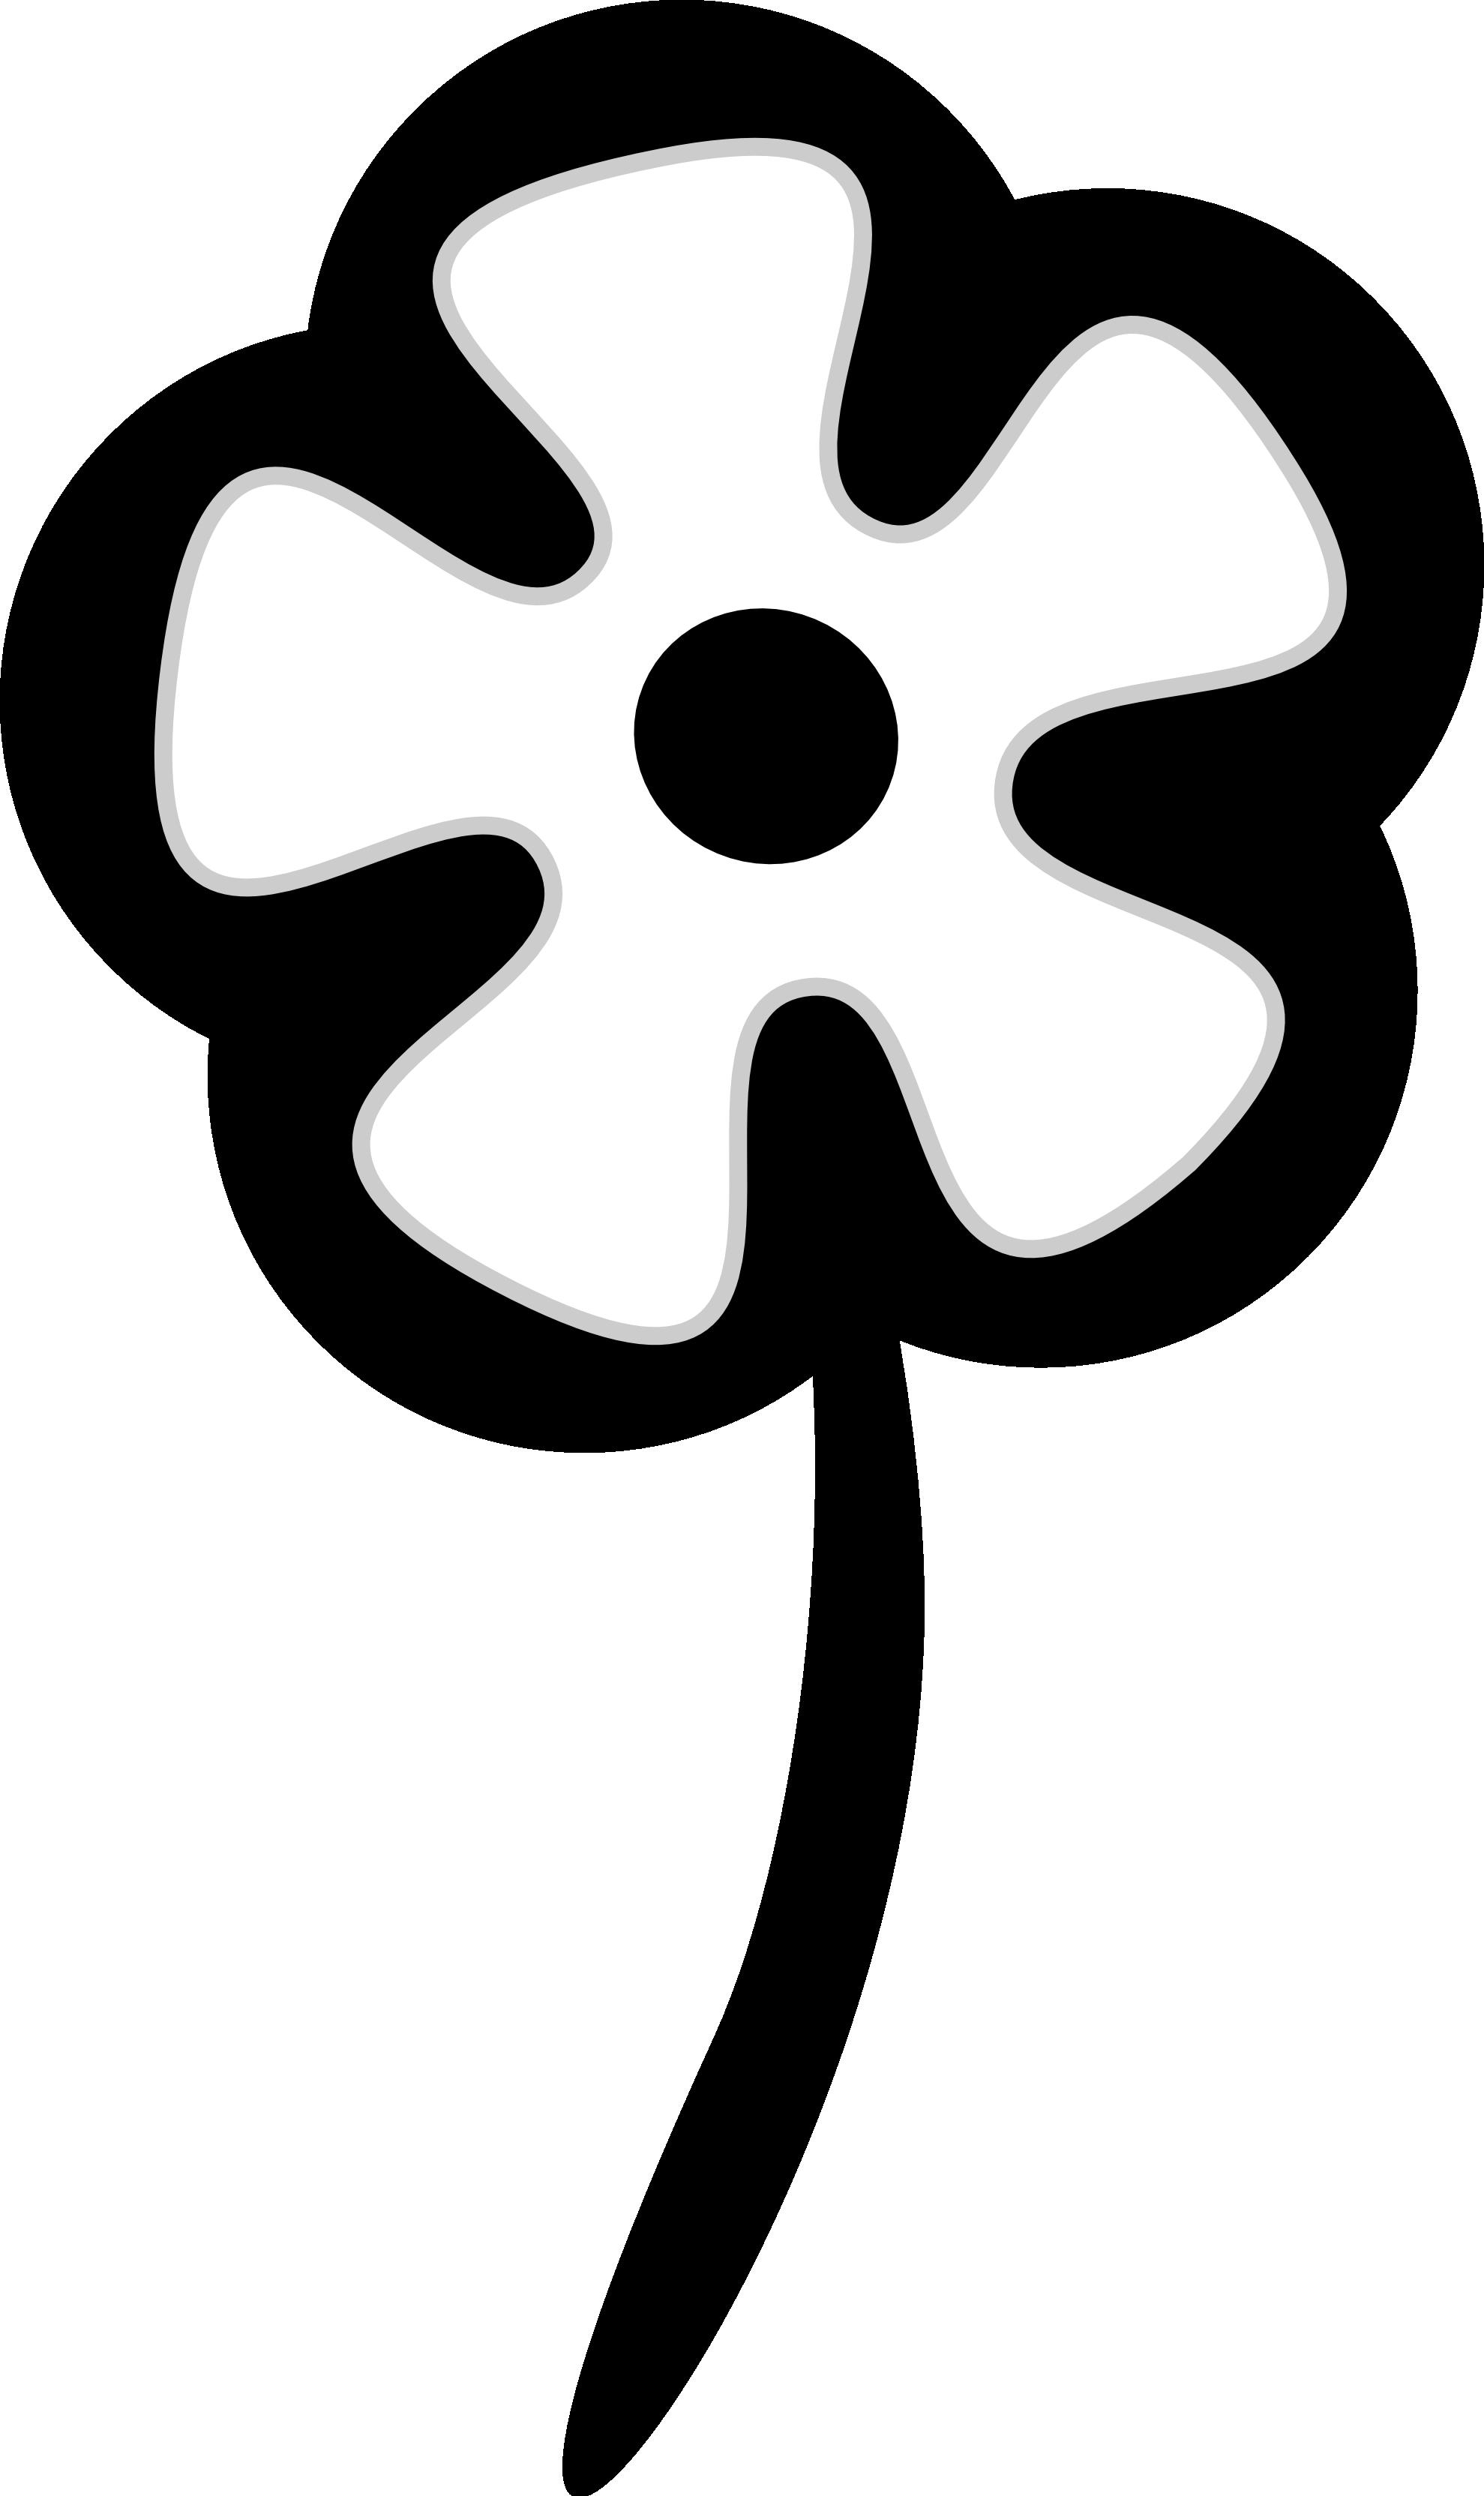 Clipart flower black and white. Clip art panda free